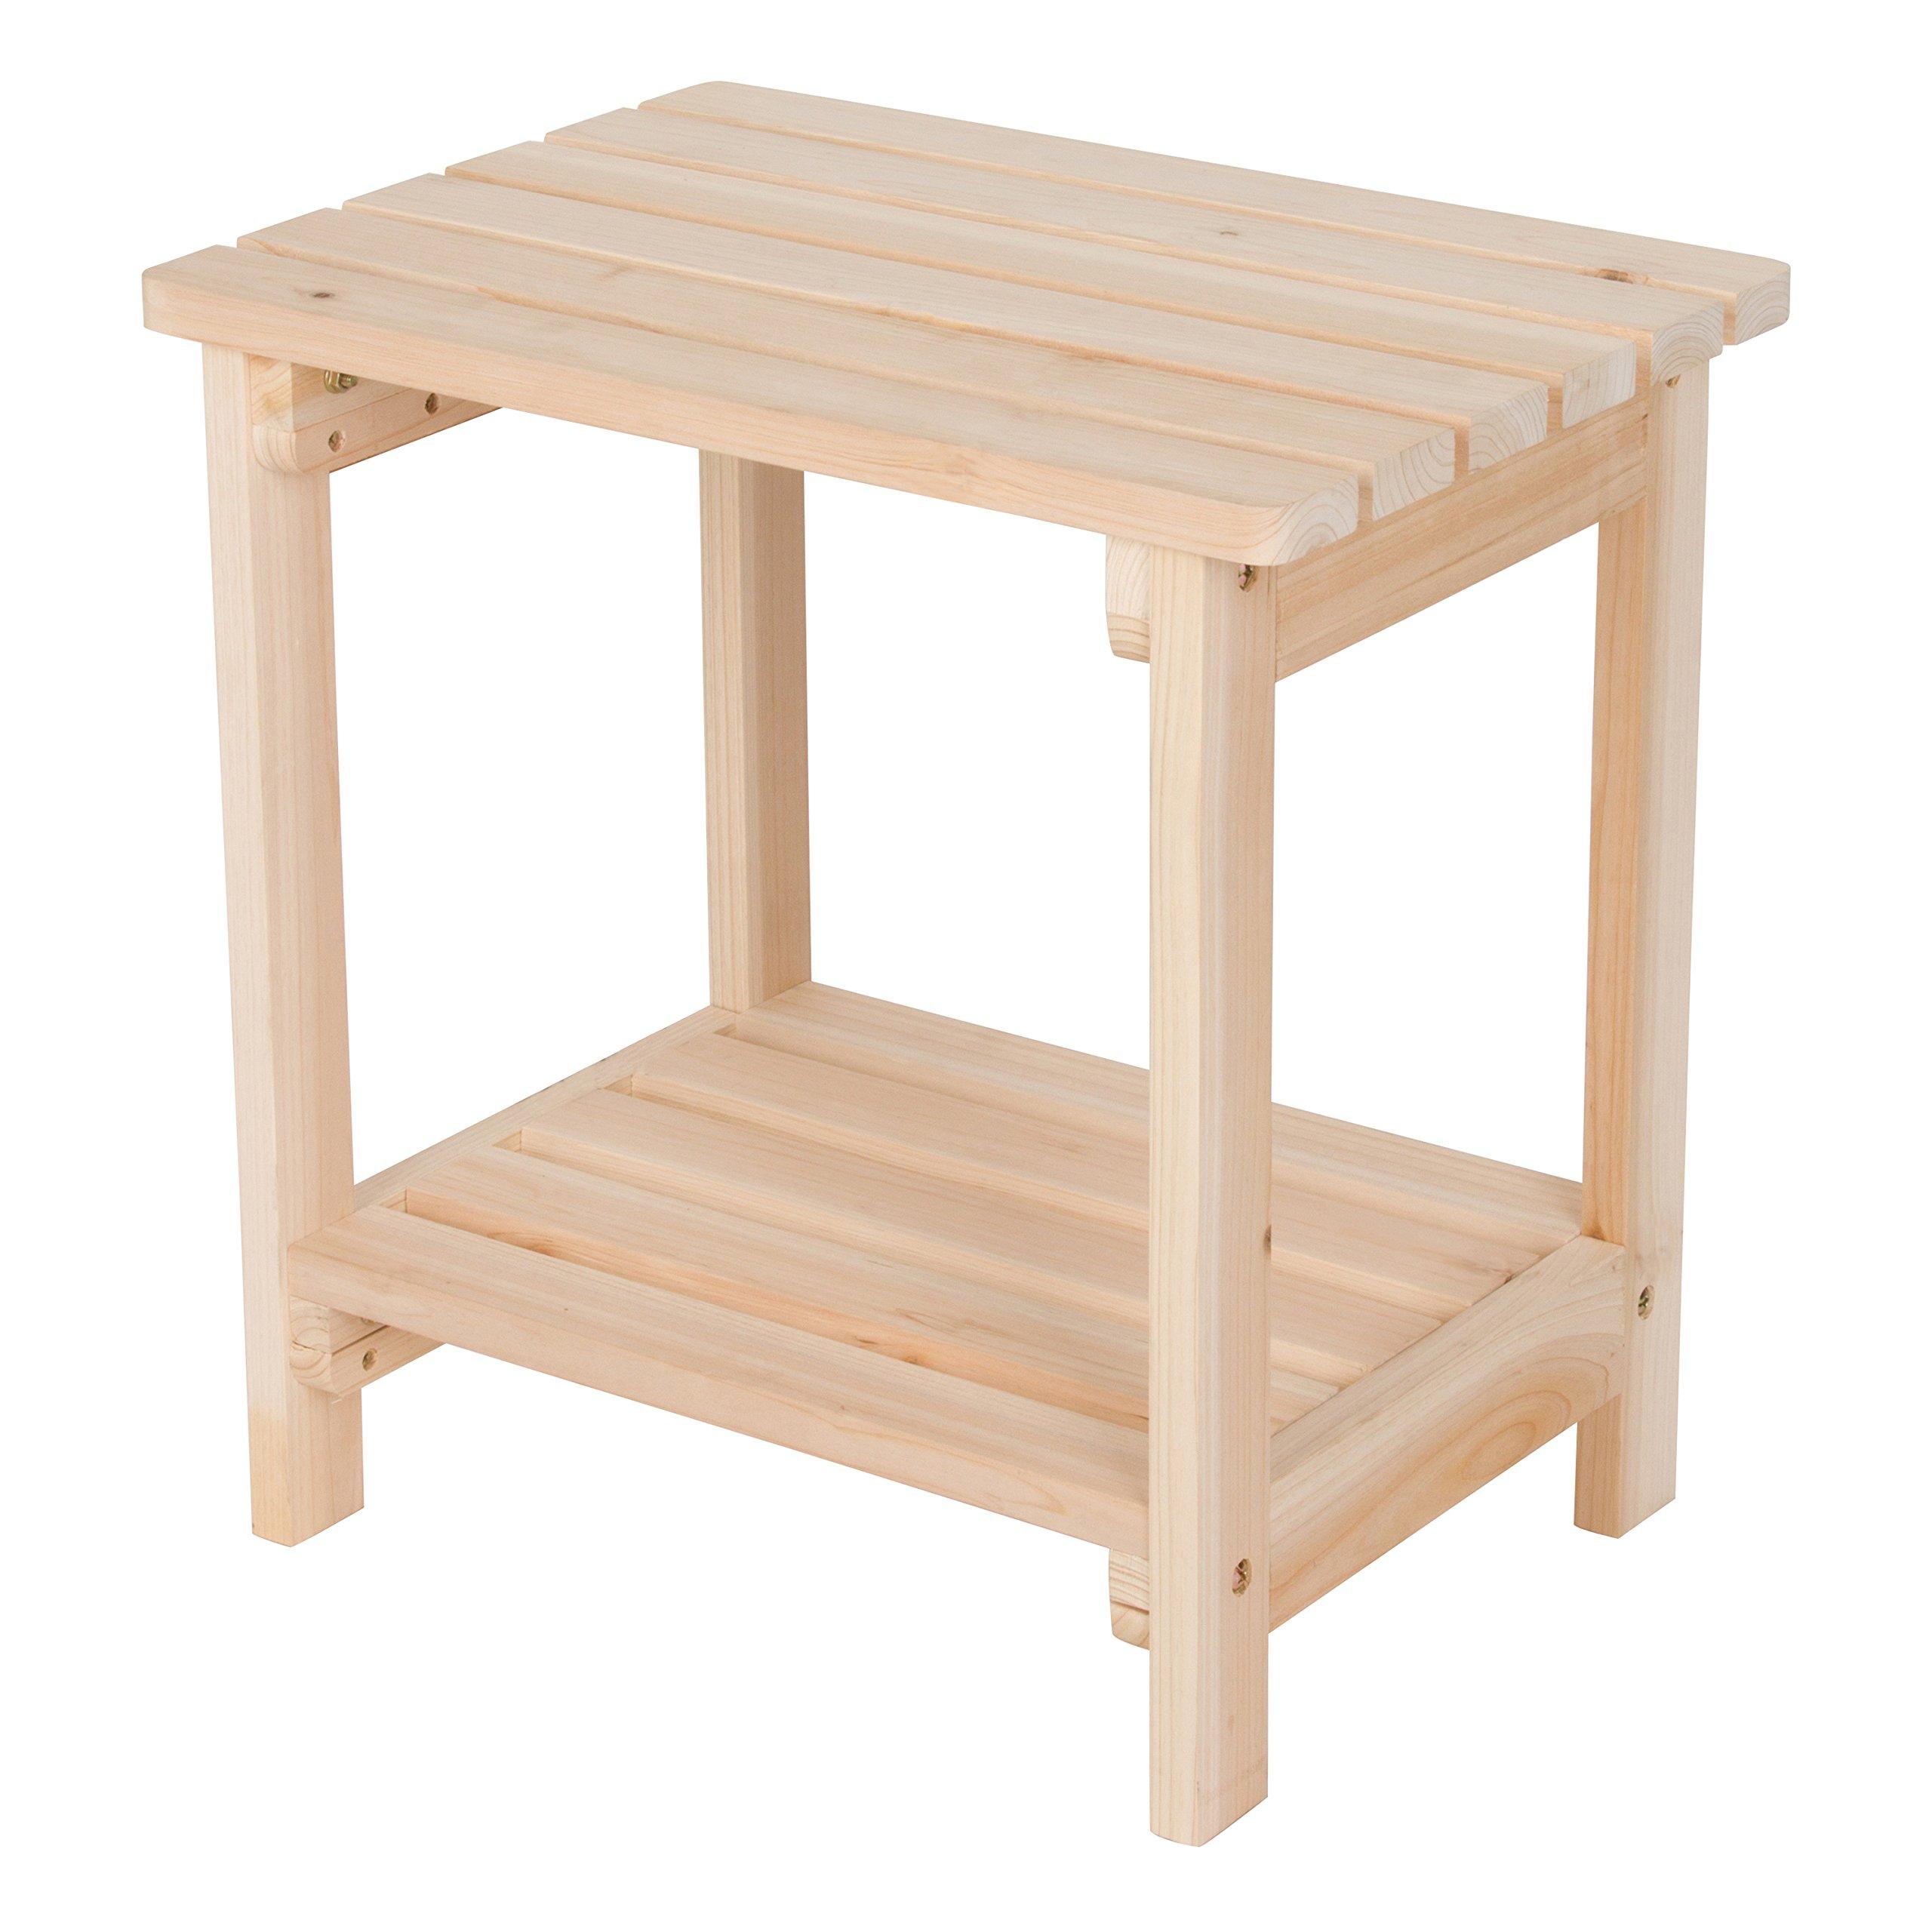 Shine Company Inc. 4104N Rectangular Side Table, Natural by Shine Company